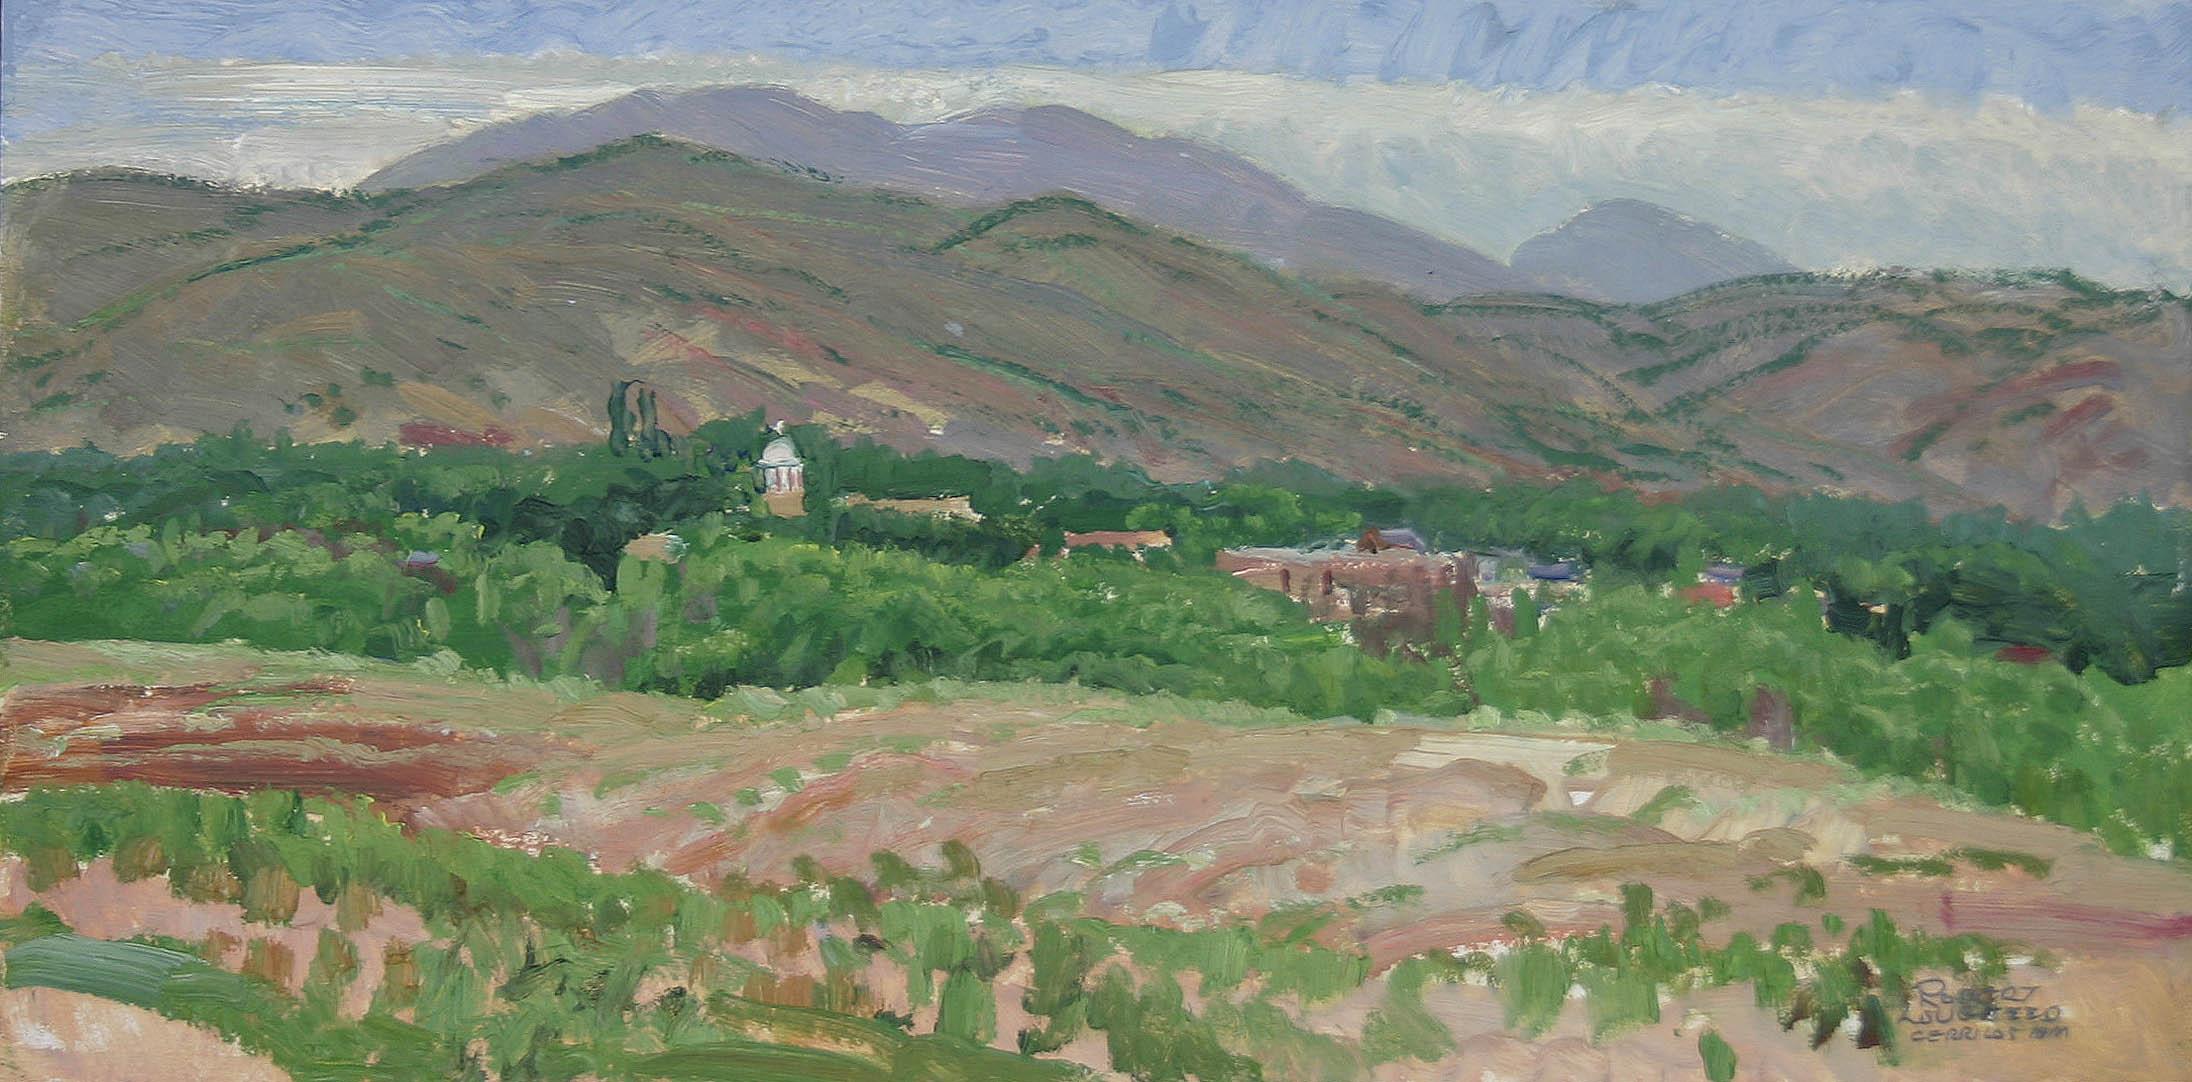 Village & Landscape by  Robert Lougheed - Masterpiece Online